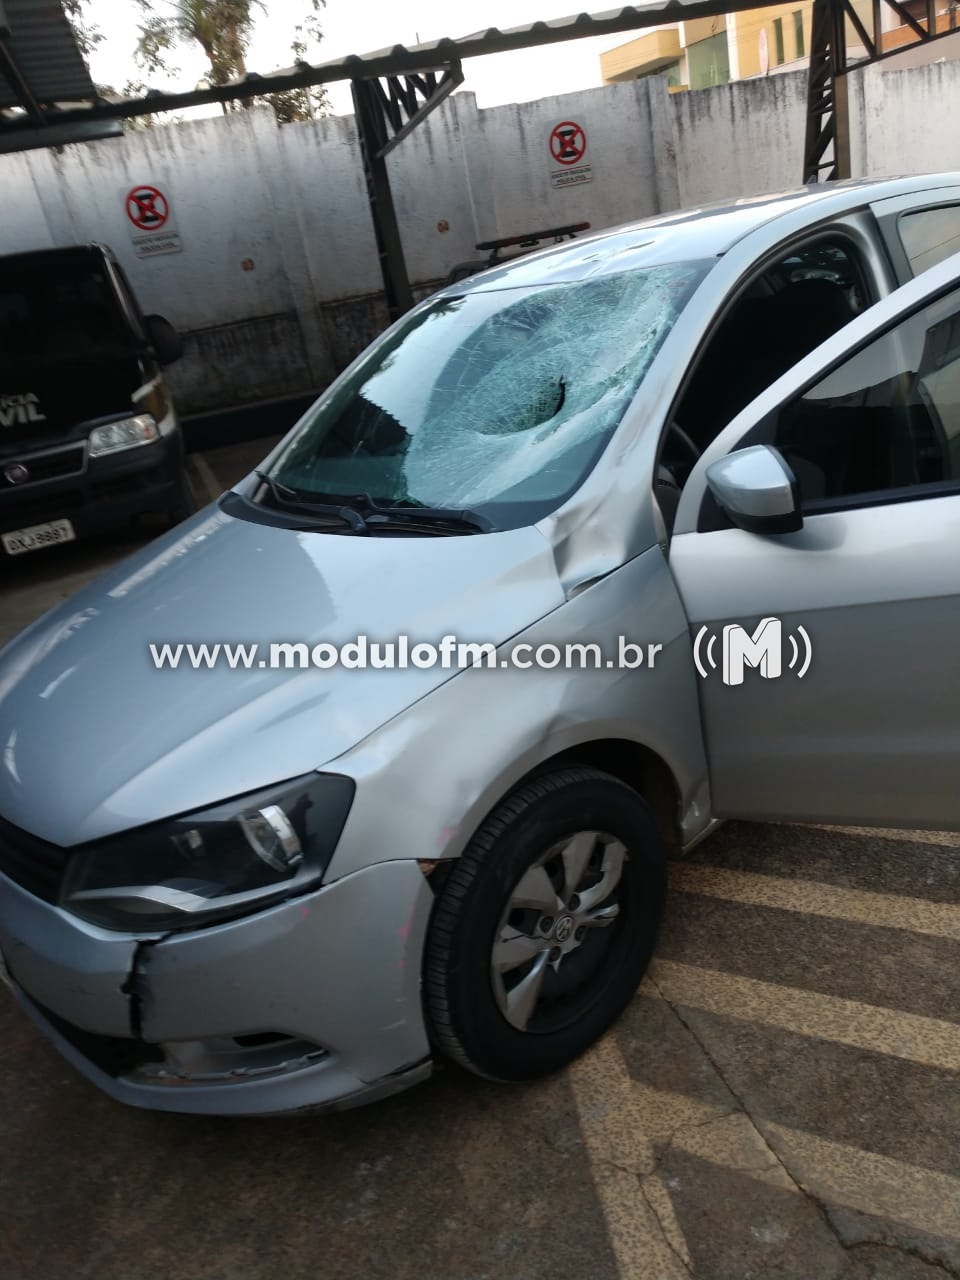 21-09-2020 acidente 01